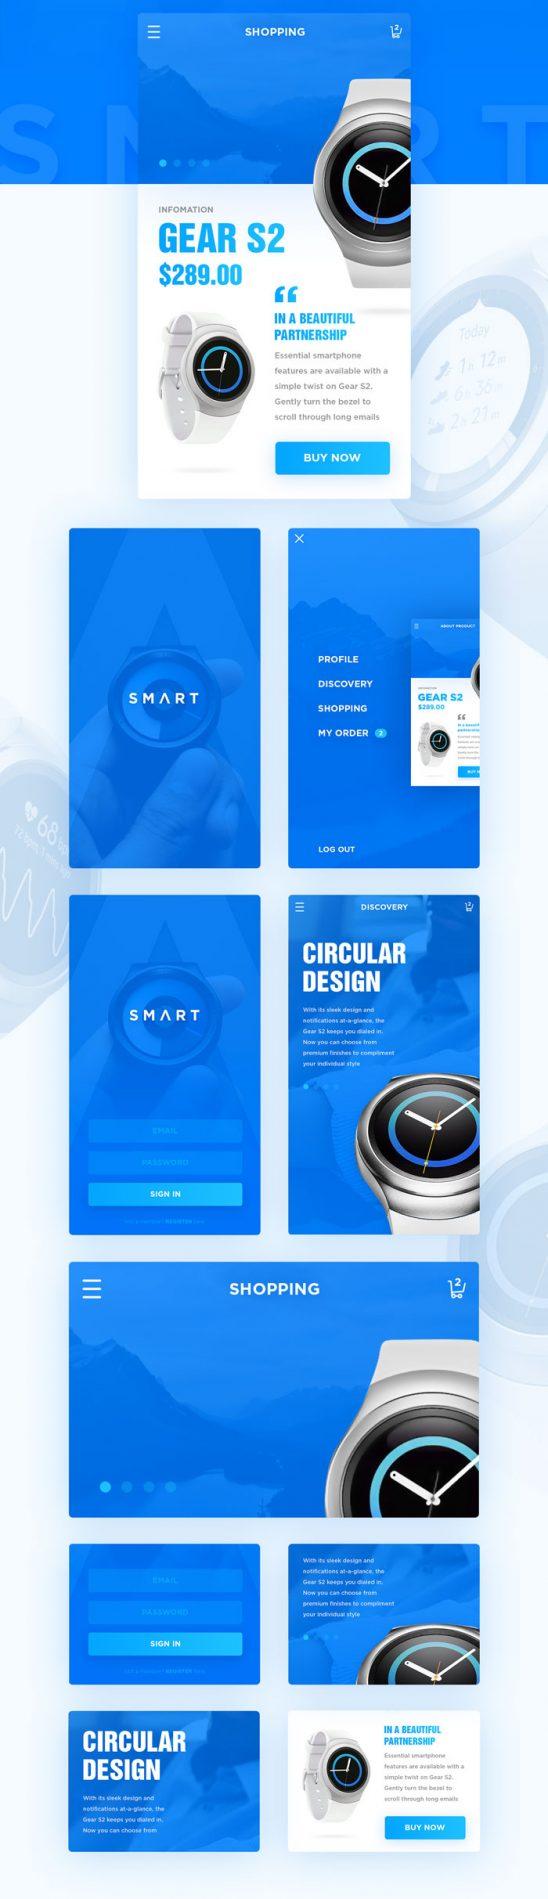 p548 548x1899 - قالب اپلکیشن فروشگاهی آبی / اینترفیس UX و UI موبایل اندورید و ios با صفحات خرید، عضویت و ورود